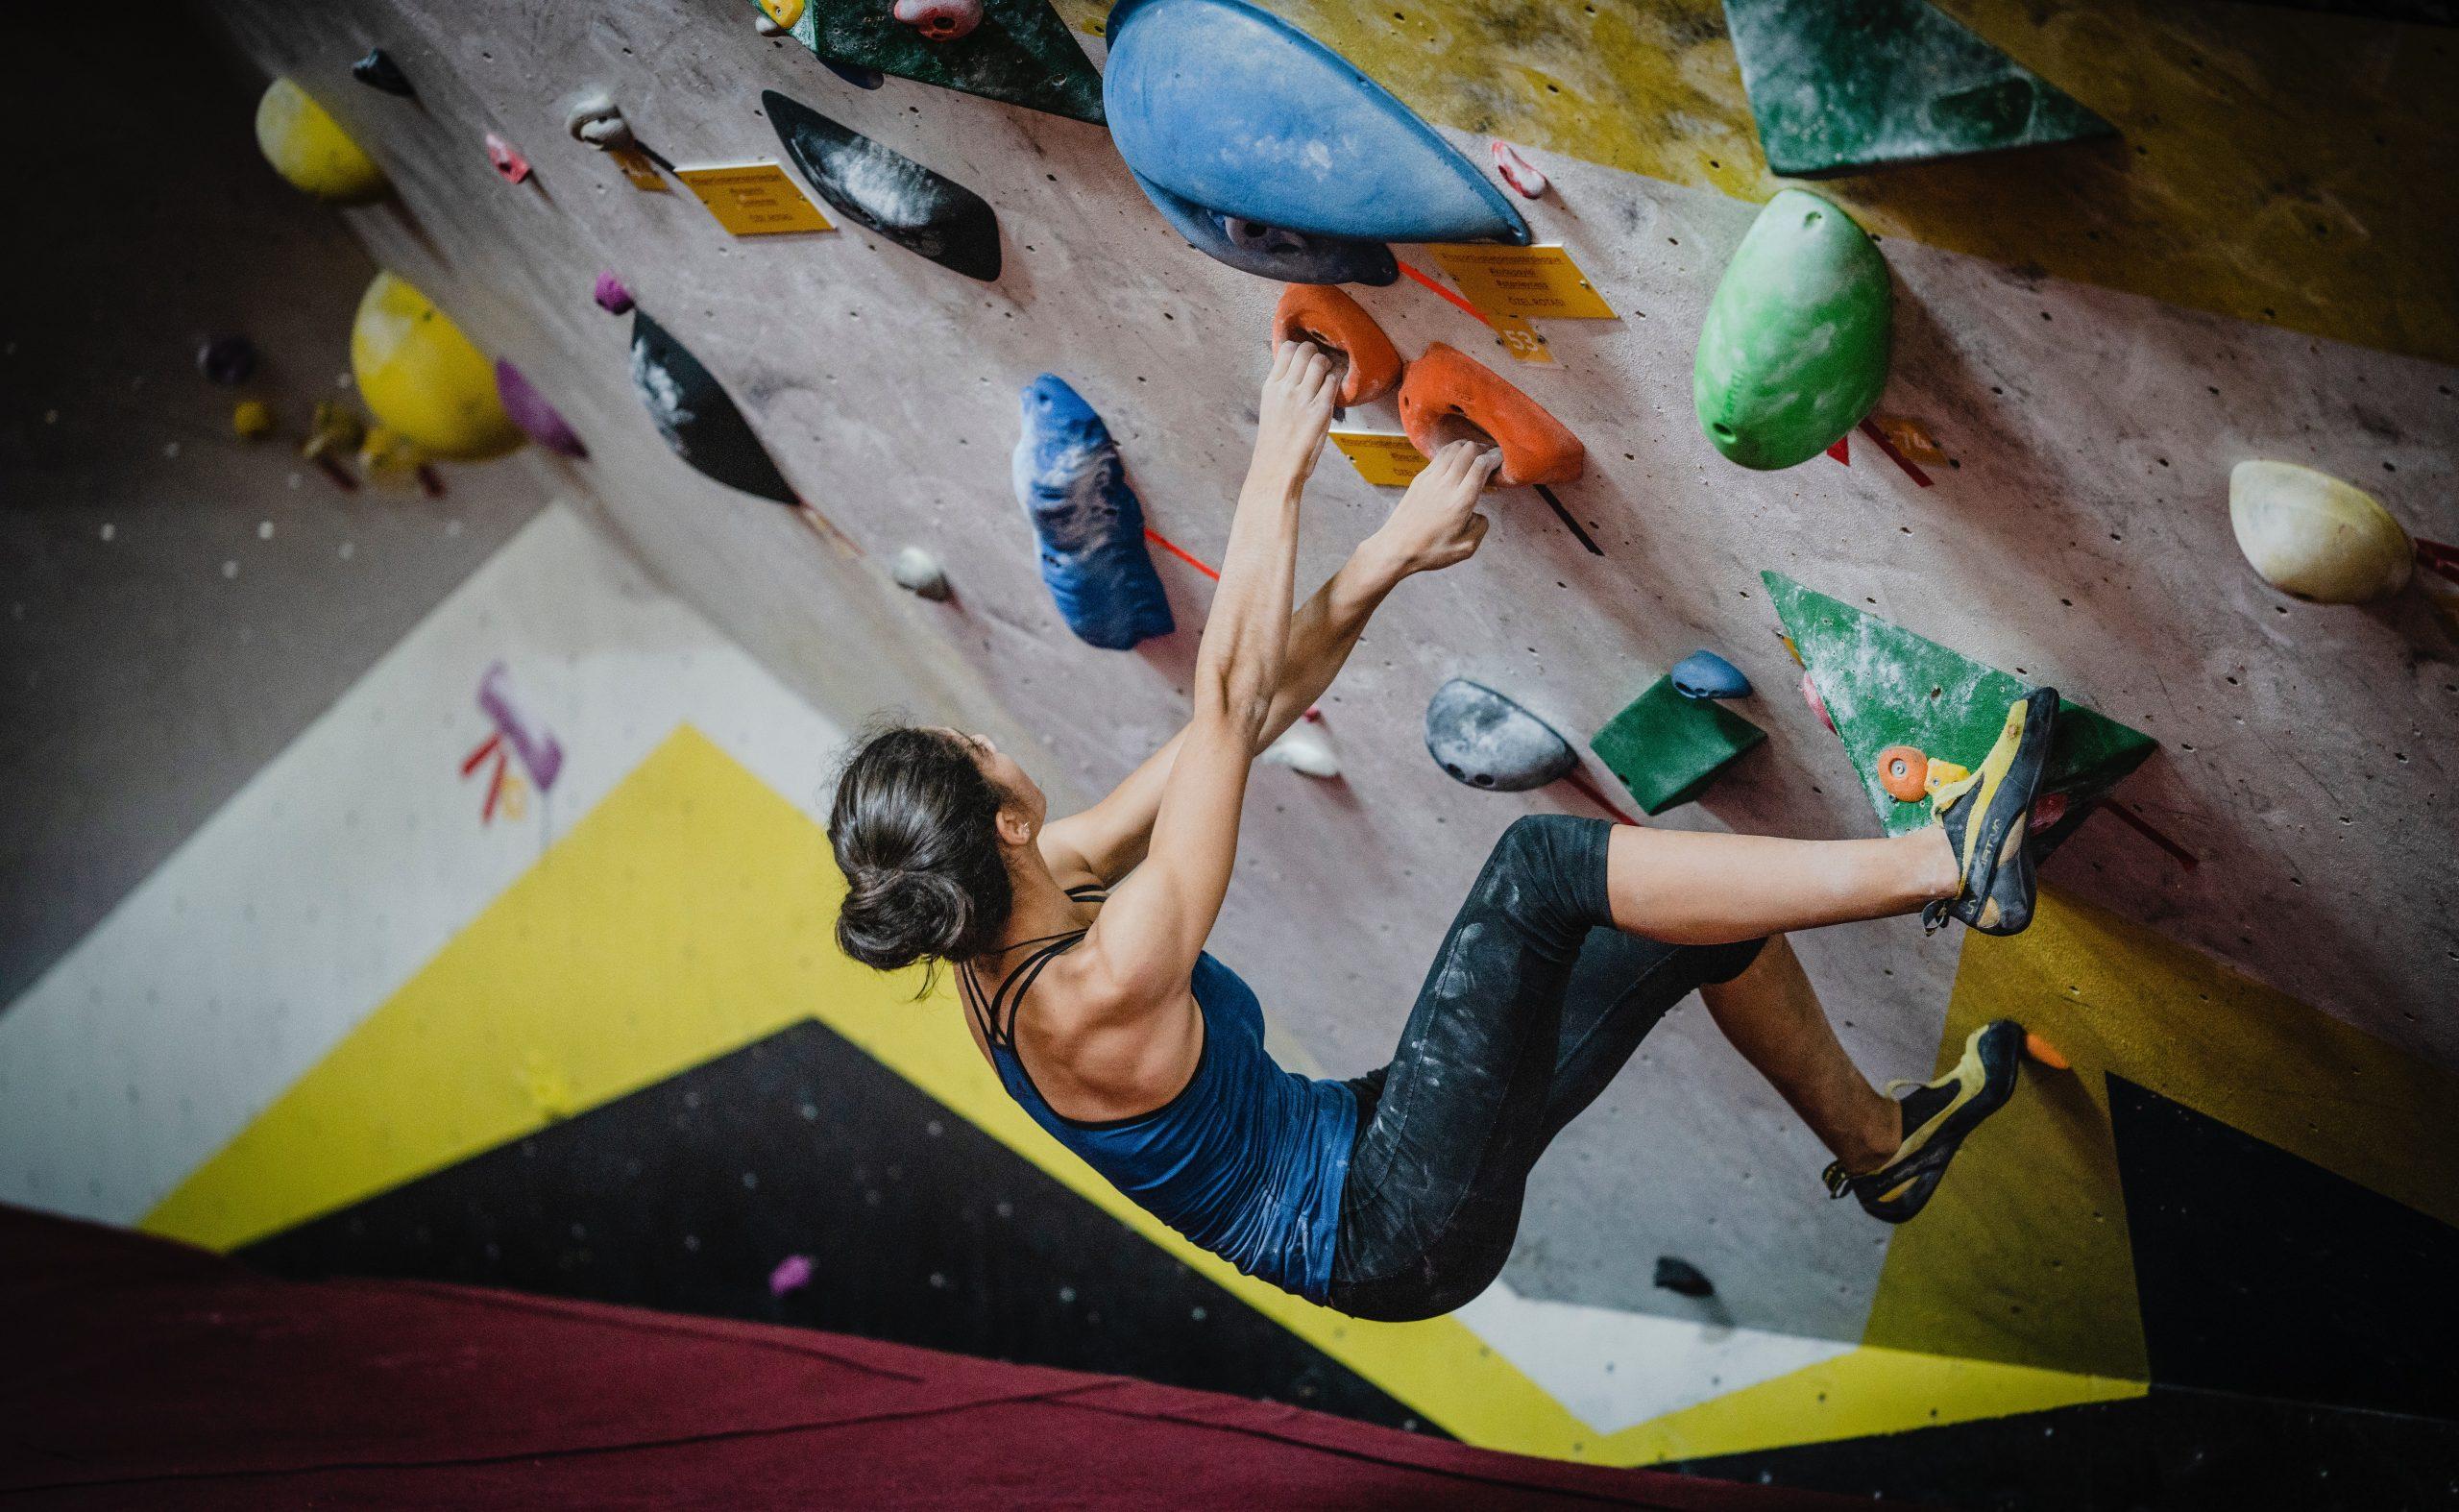 Escalada esportiva: como acompanhar a estreia da modalidade nas Olimpíadas